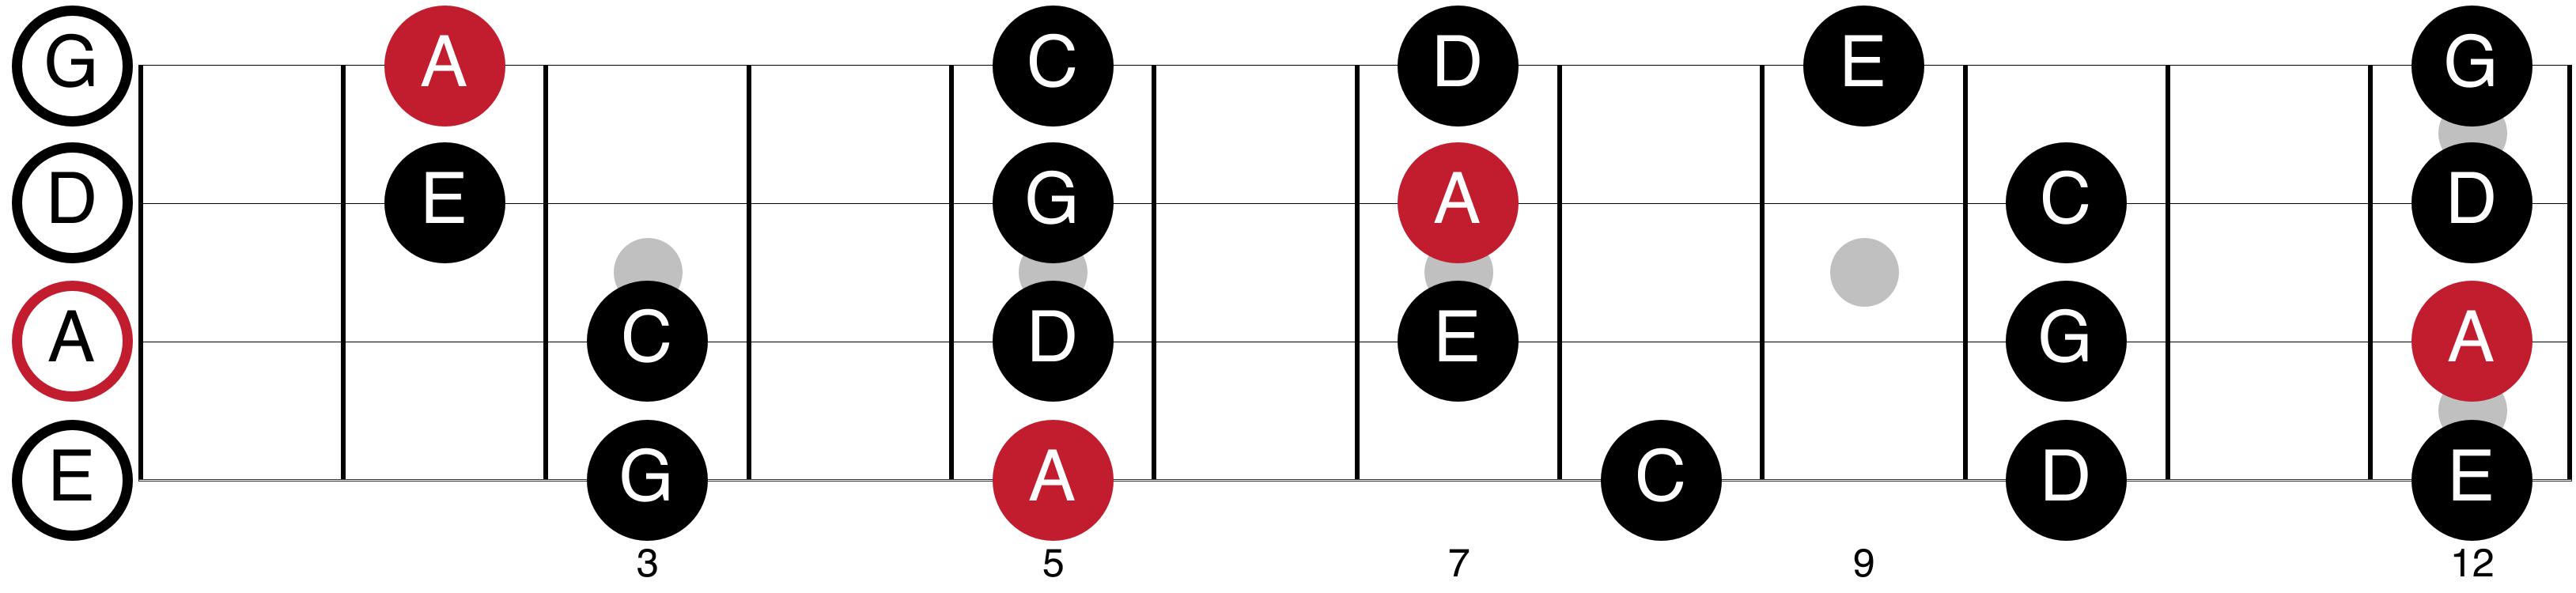 A Minor Pentatonic Shapes For Bass Guitar